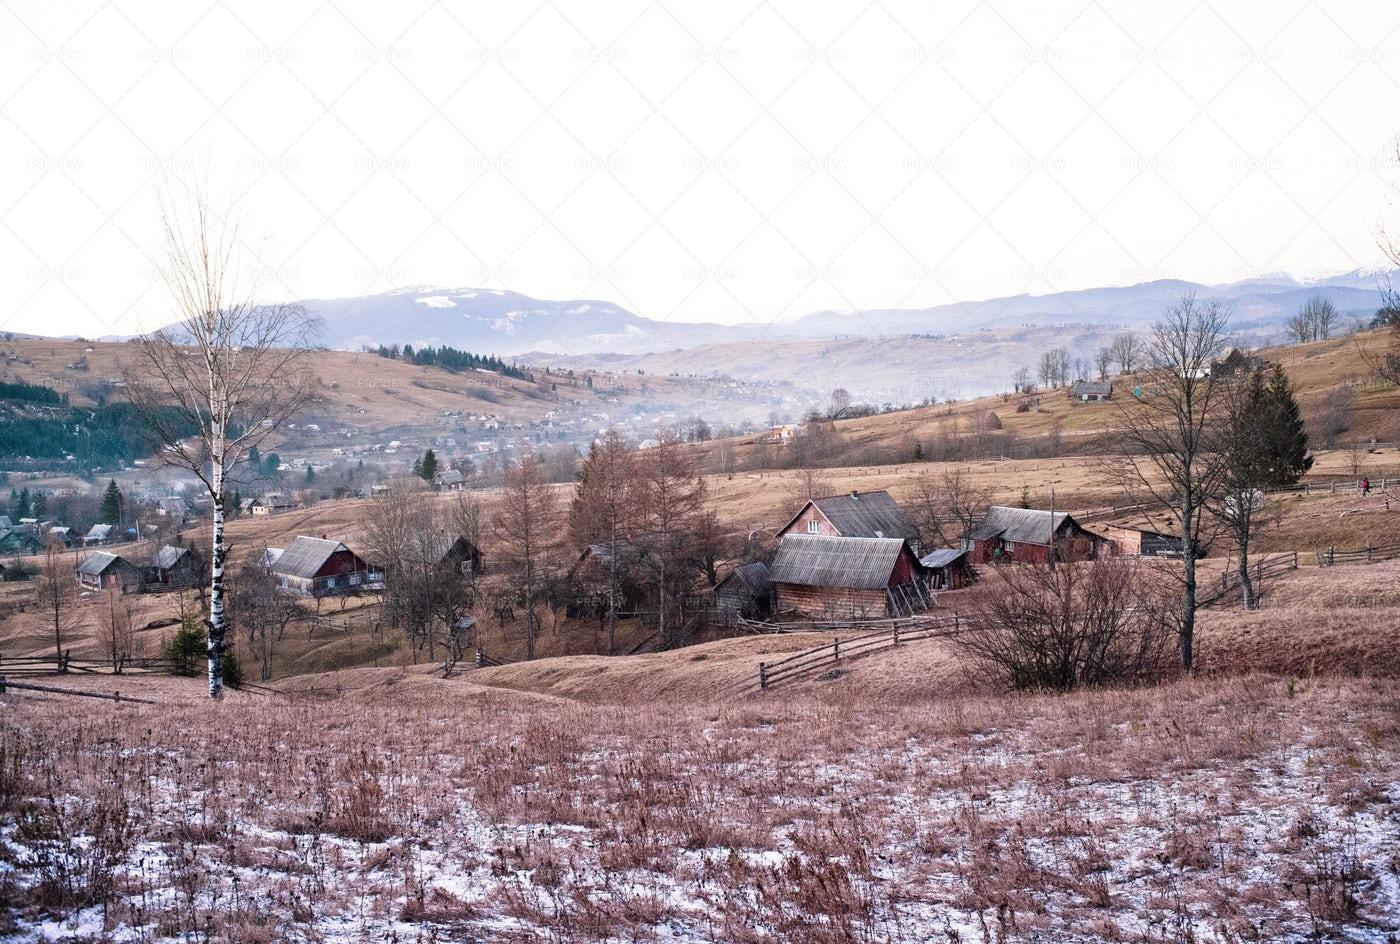 The Morning In The Mountain Village: Stock Photos